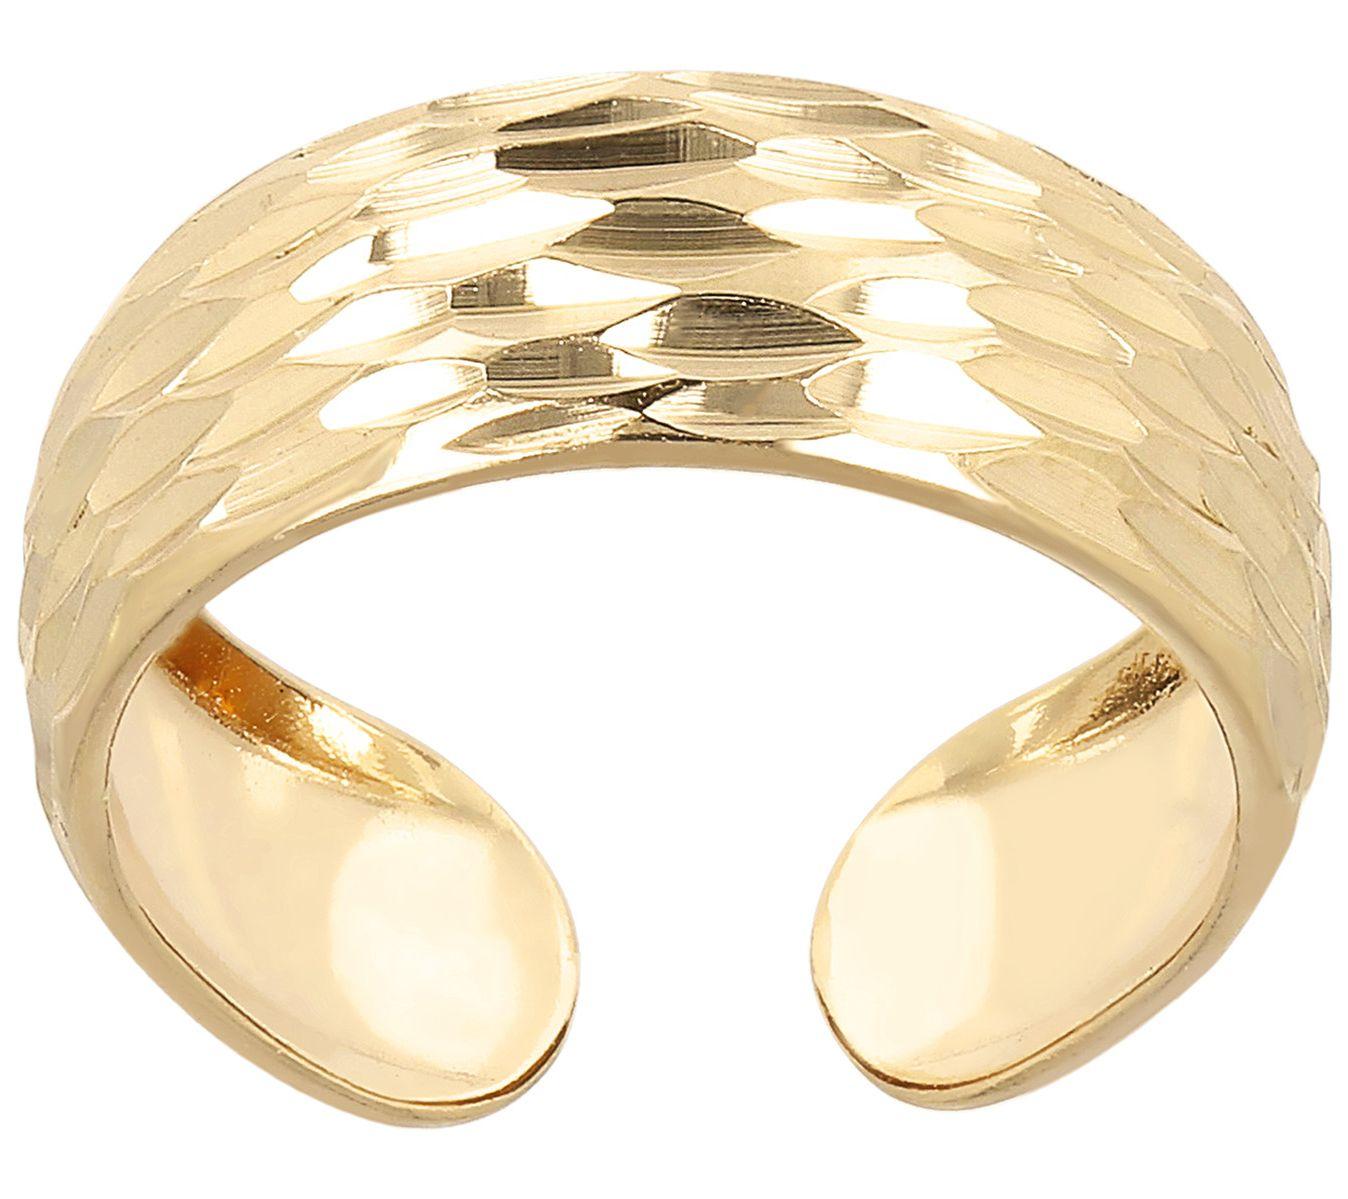 Veronese 18K Clad Adjustable Diamond-Cut Toe Ring